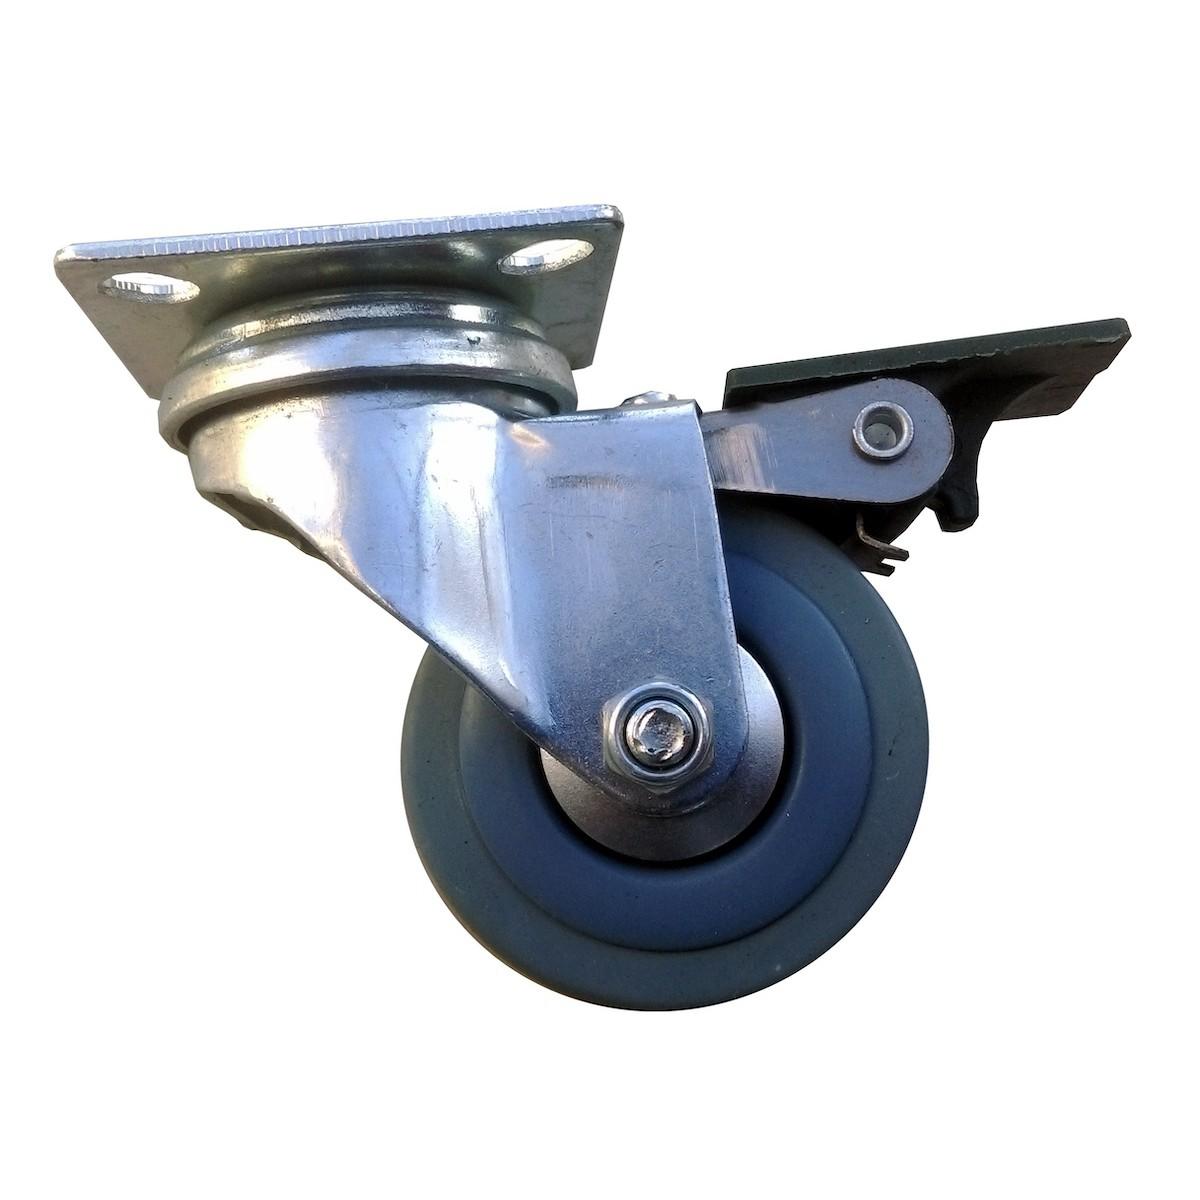 koleso náhradné 50mm sivé 40kg kolesová brzda HABI megamix.sk